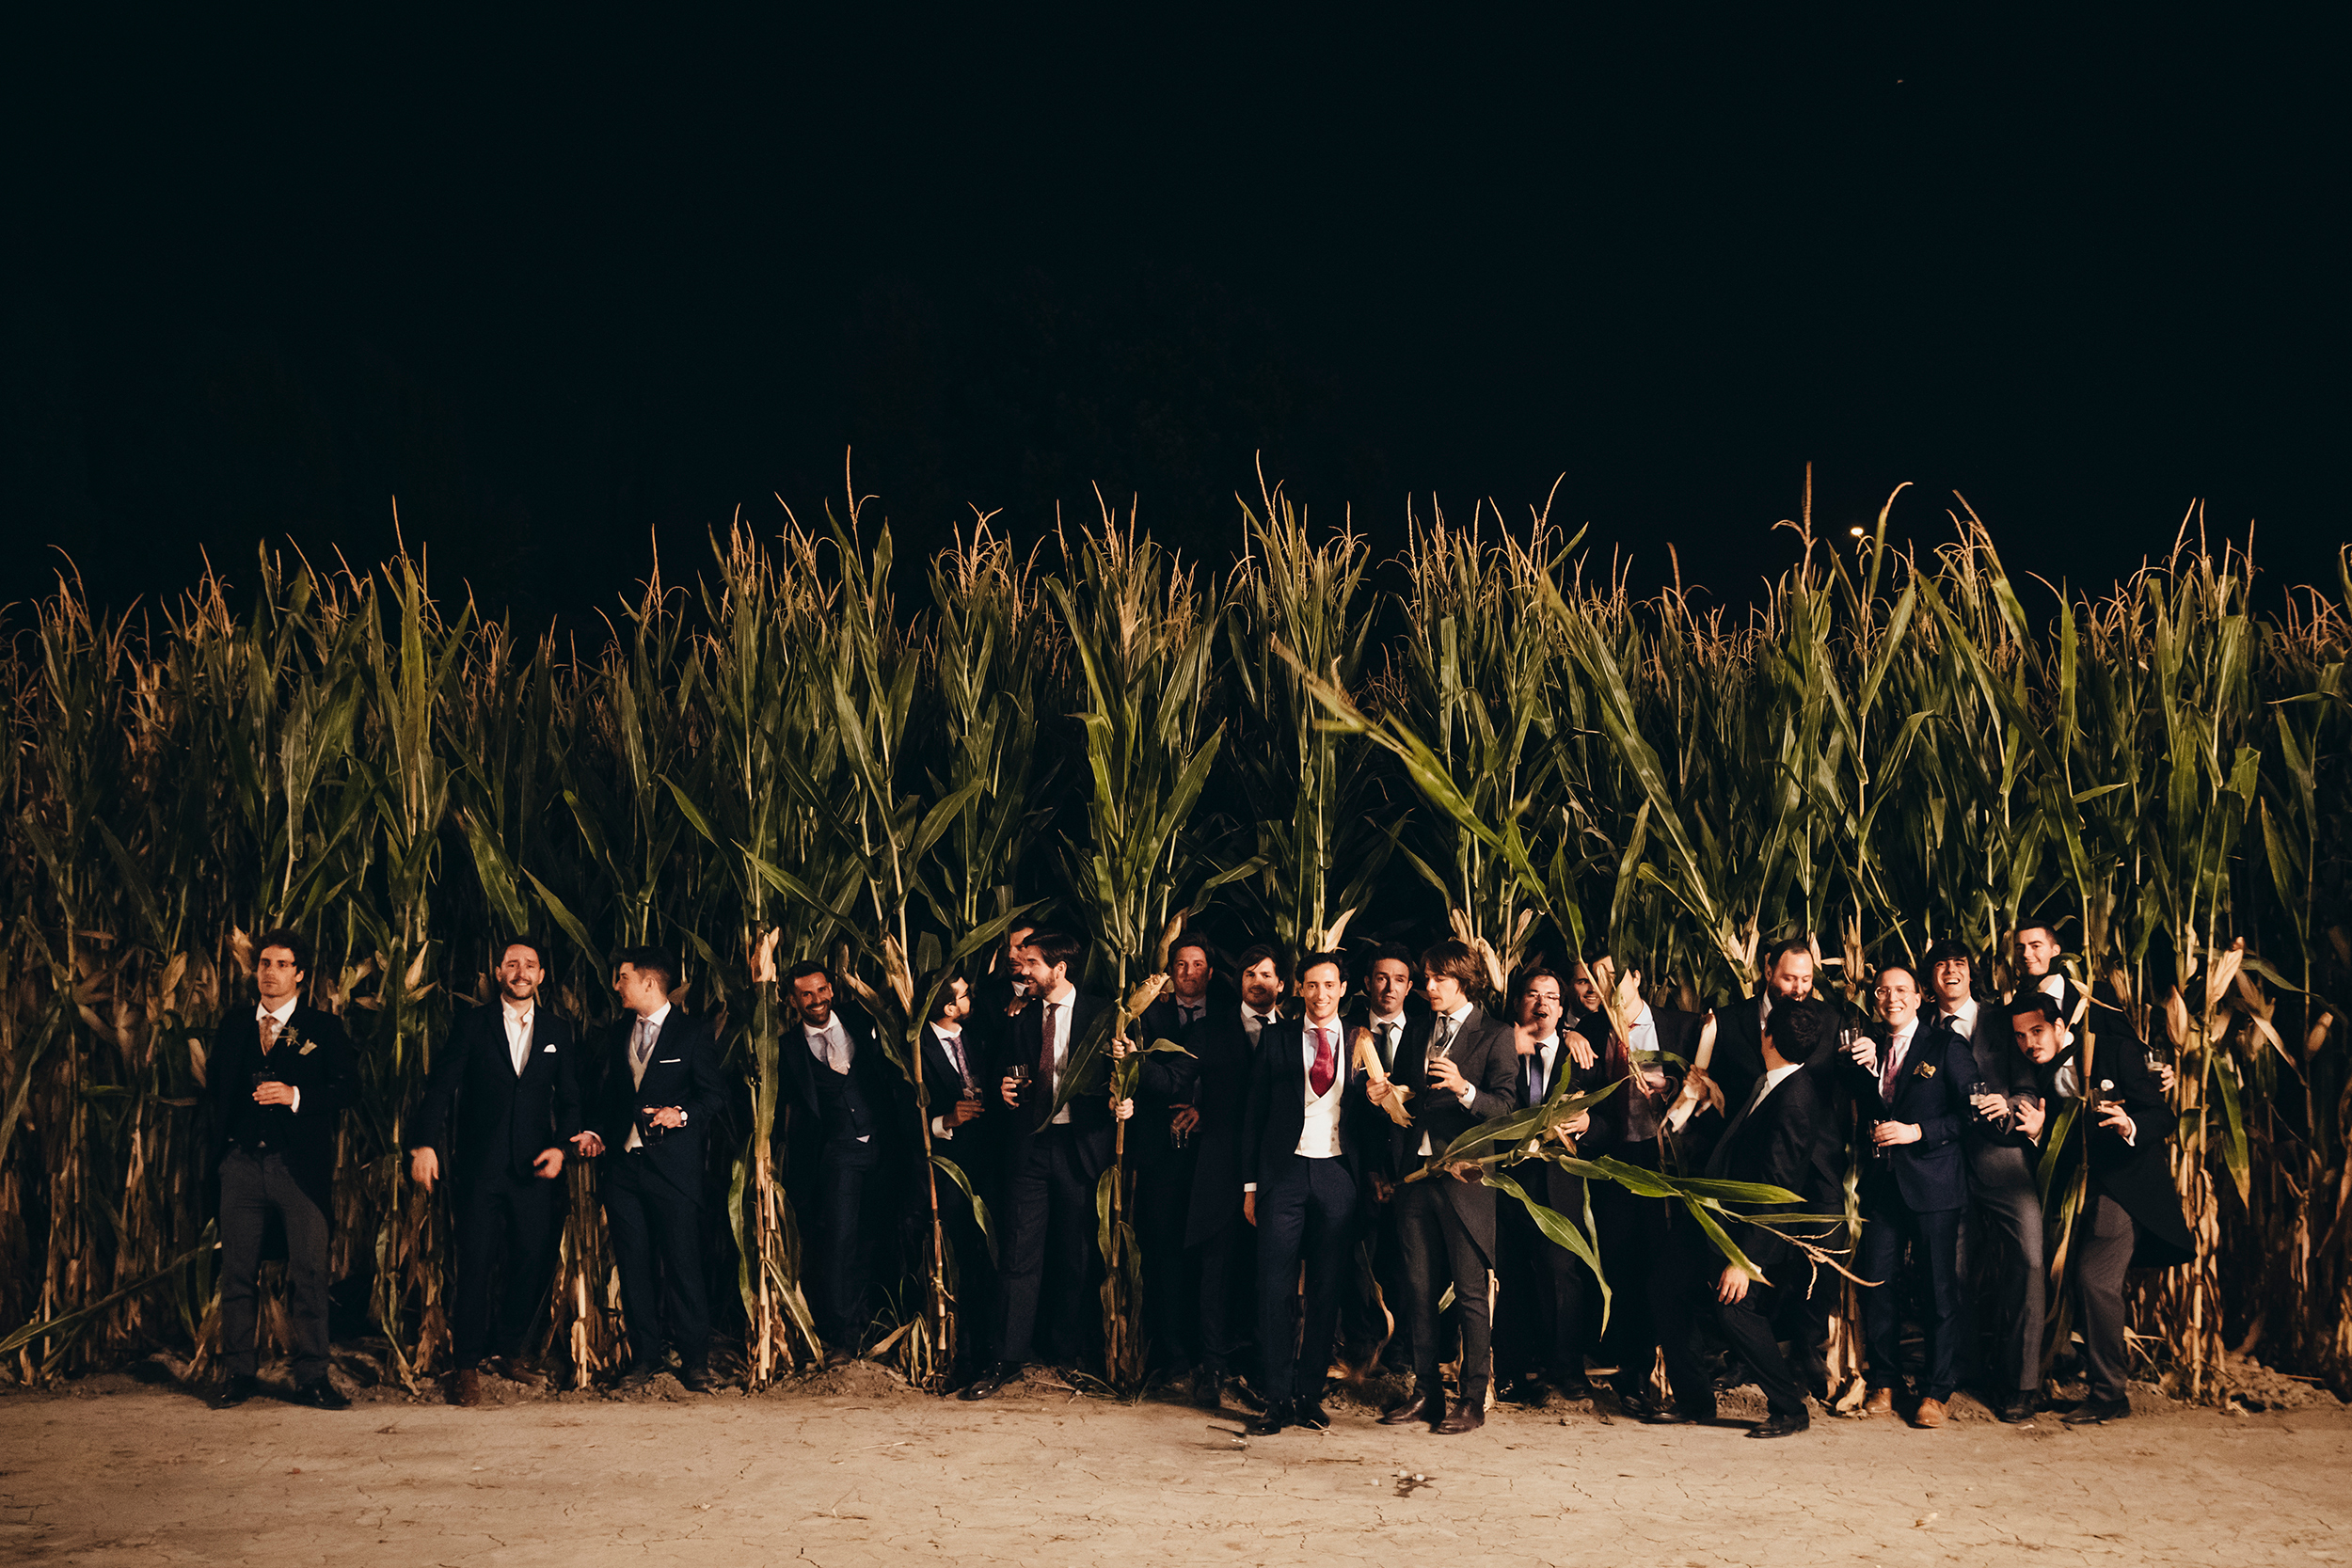 fotografo-bodas-granada-catedral-sagrario-jose-reyes_100.jpg